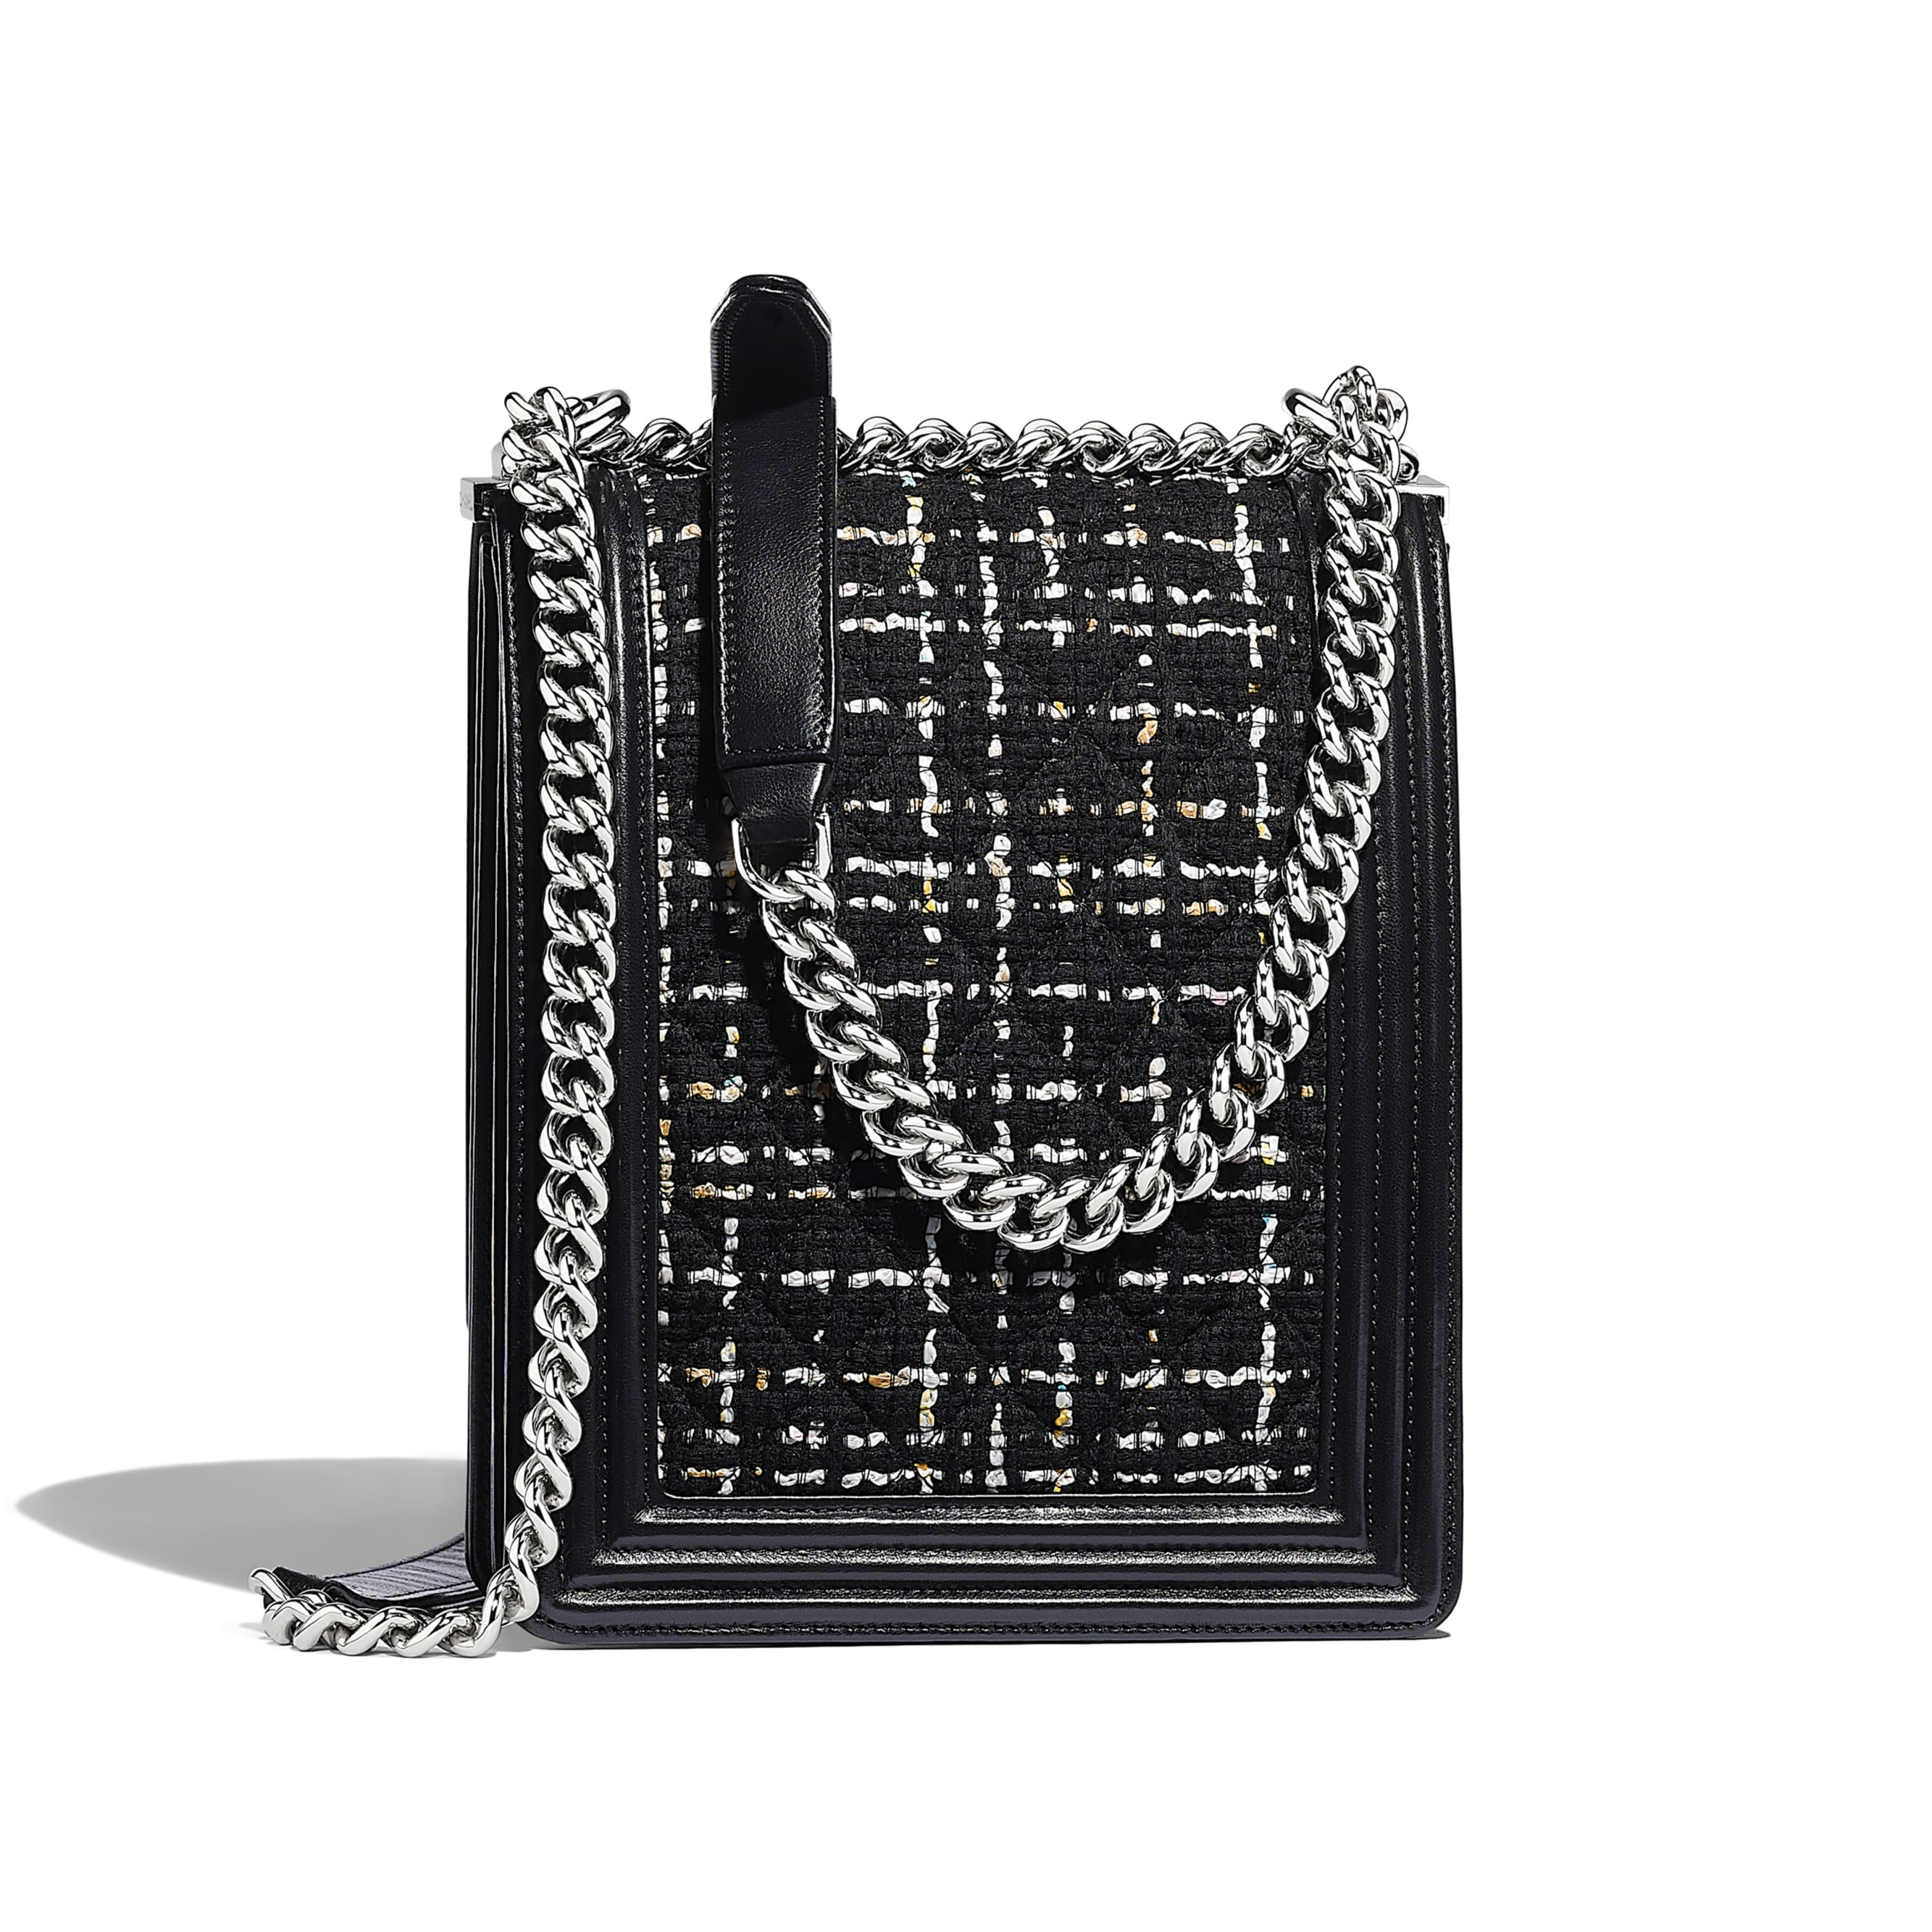 BOY CHANEL Handbag - Black, White, Pink & Yellow - Tweed, Calfskin & Silver-Tone Metal - Alternative view - see standard sized version